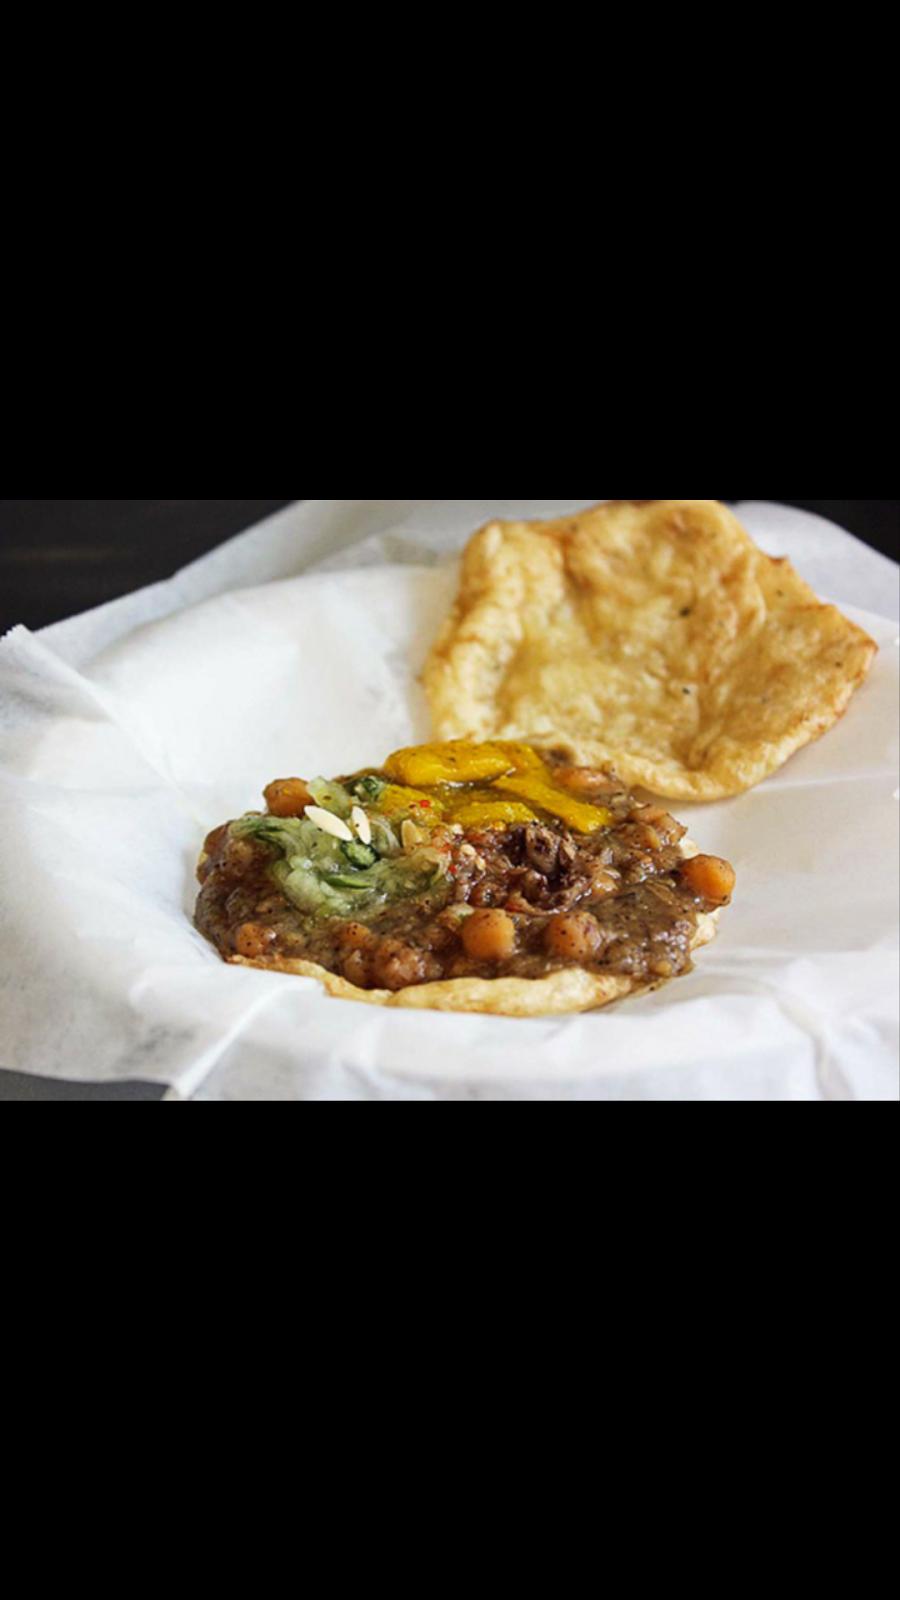 Taste Of The Caribbean Roti Shop   restaurant   800 Communipaw Ave, Jersey City, NJ 07304, USA   2013326654 OR +1 201-332-6654